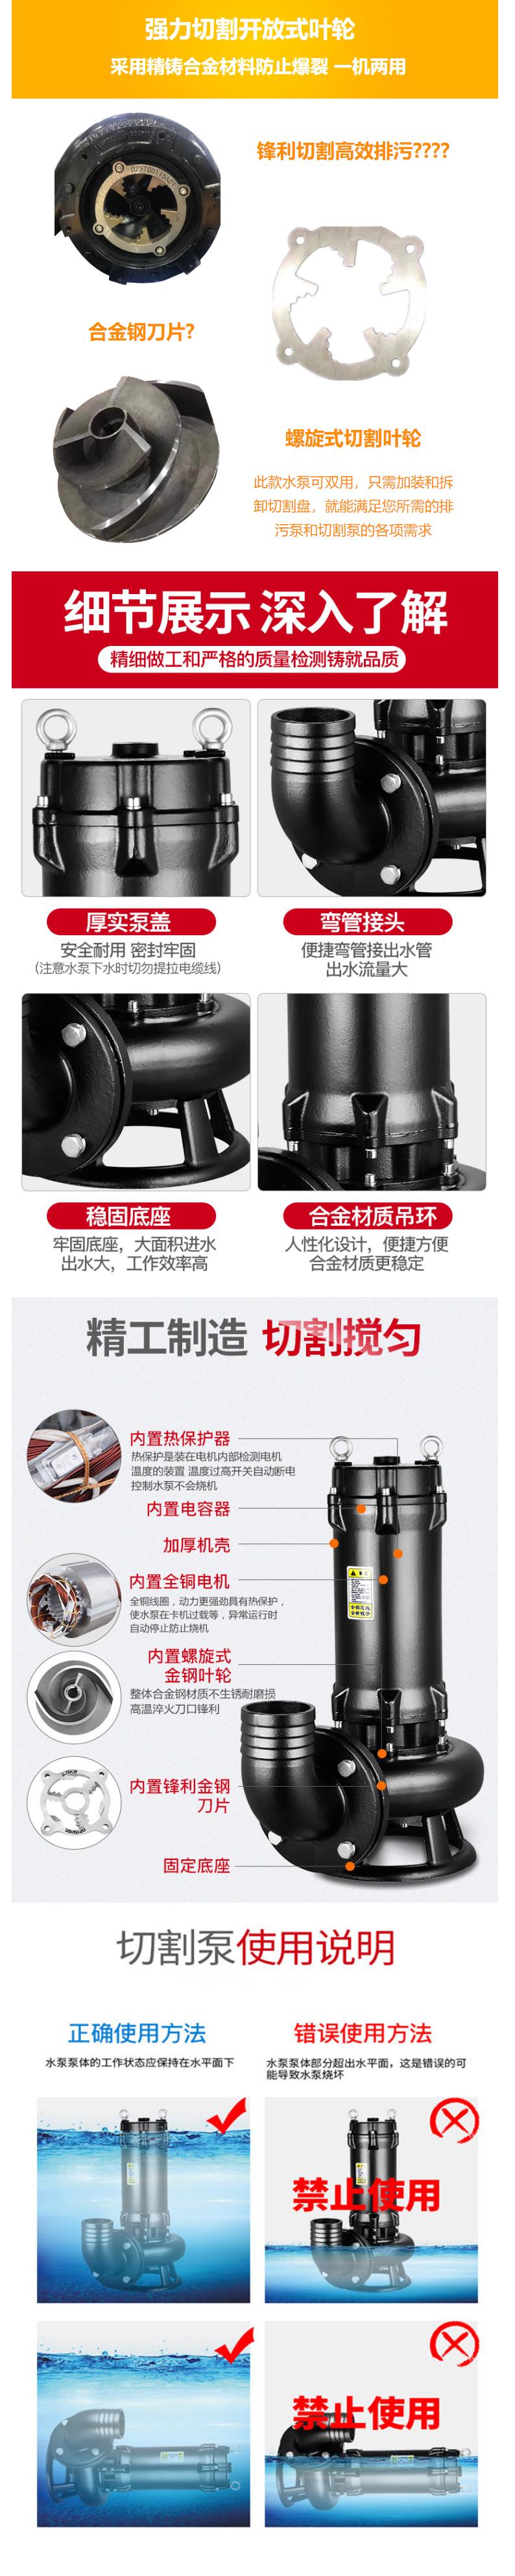 WQGN WQAS型切割式污水泵02.jpg